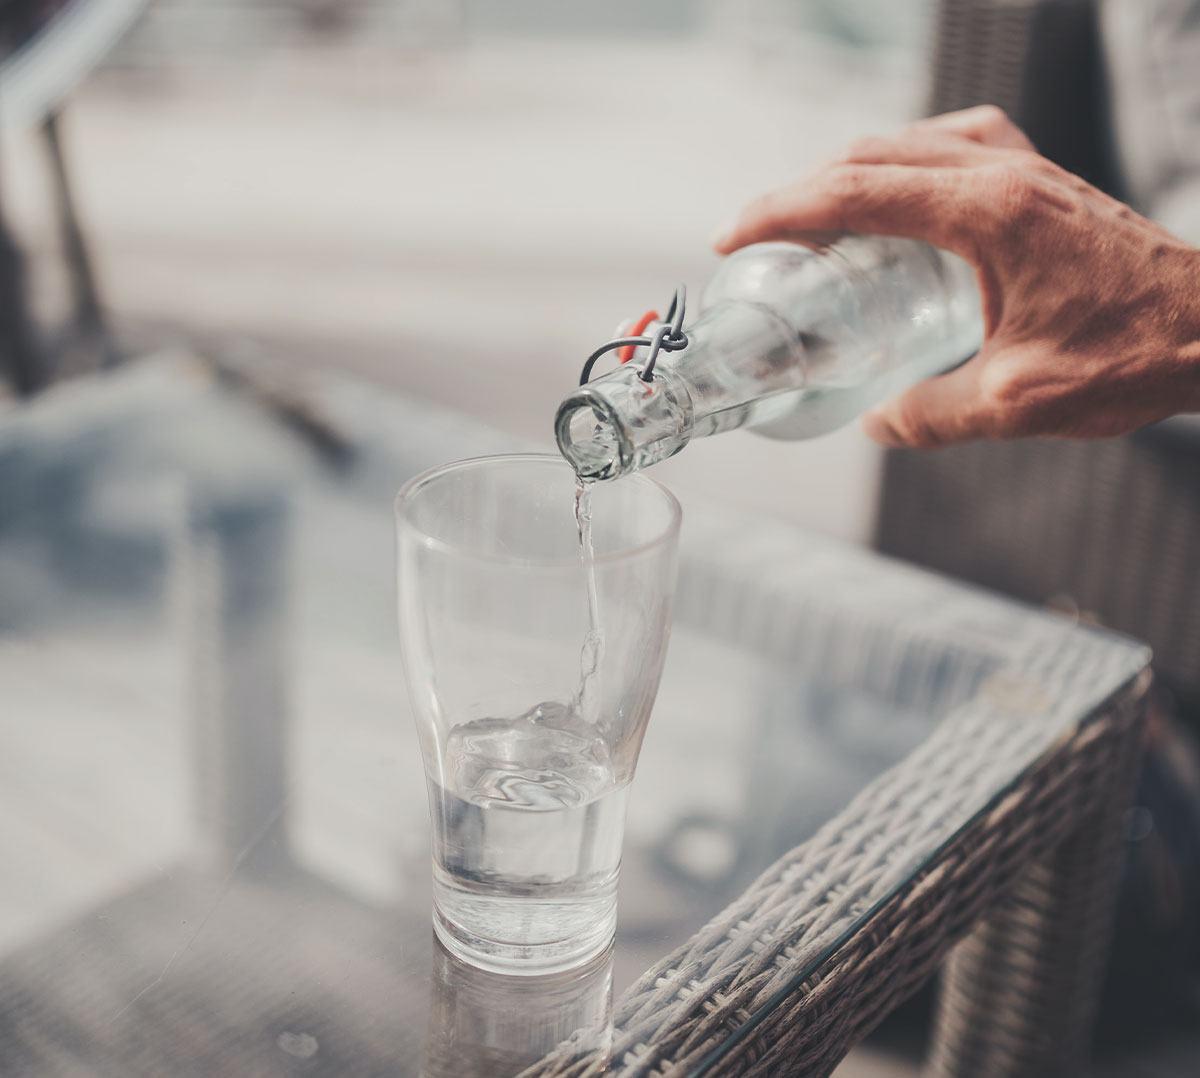 Por que é importante hidratar-se?